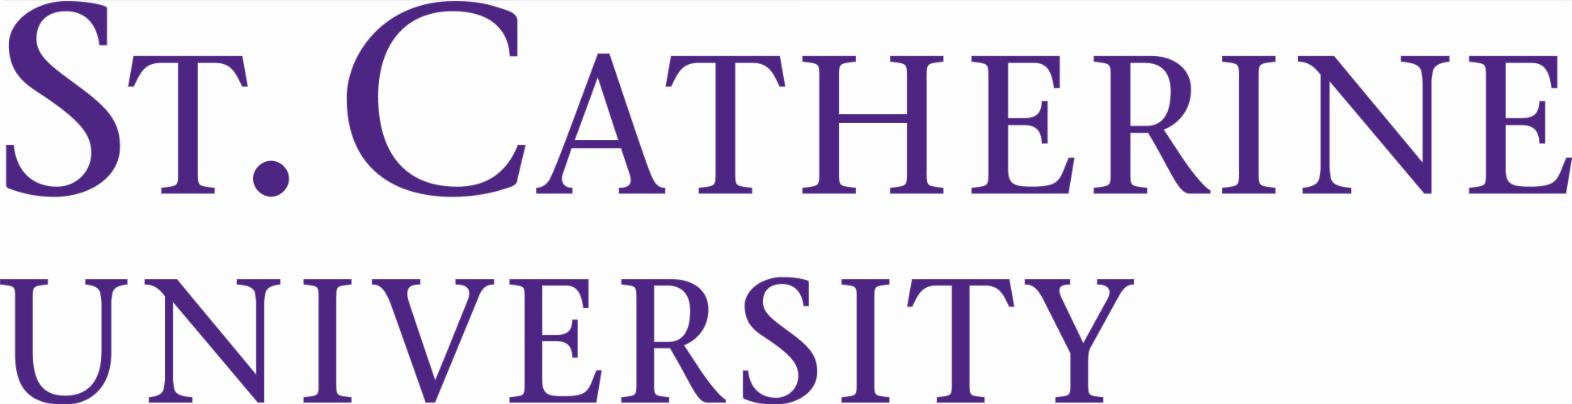 2013_St._Catherine_University_logo.jpg